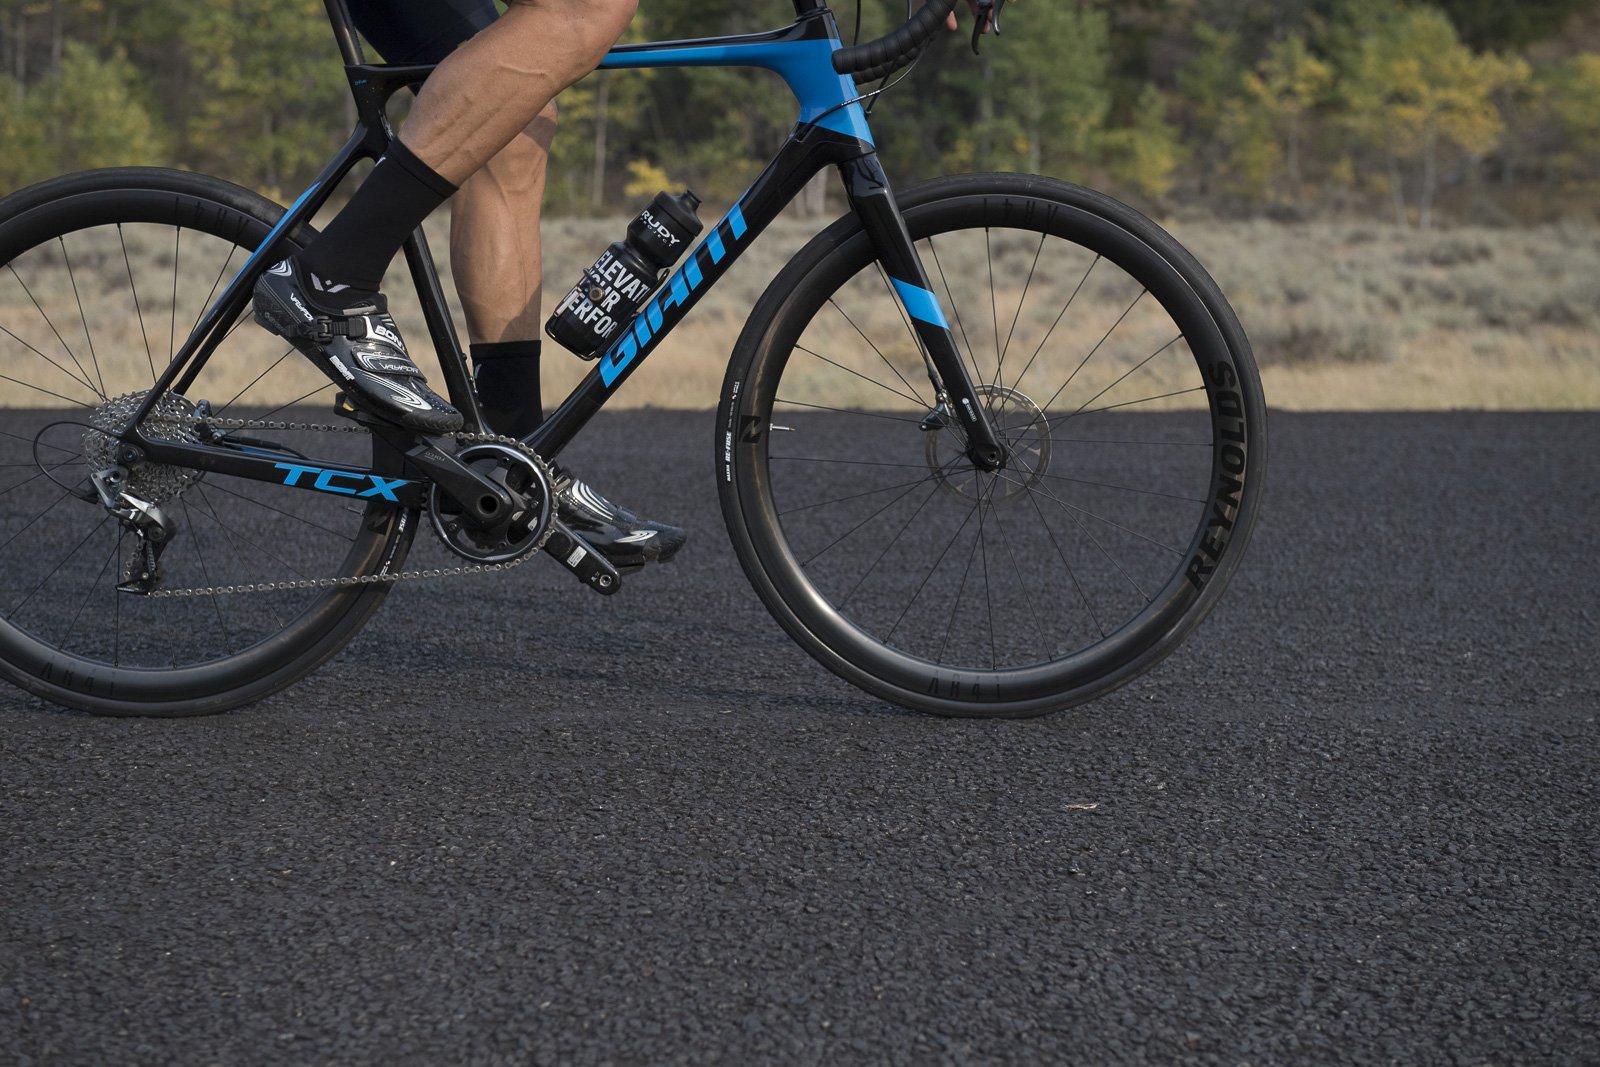 Reynolds carbon wheels